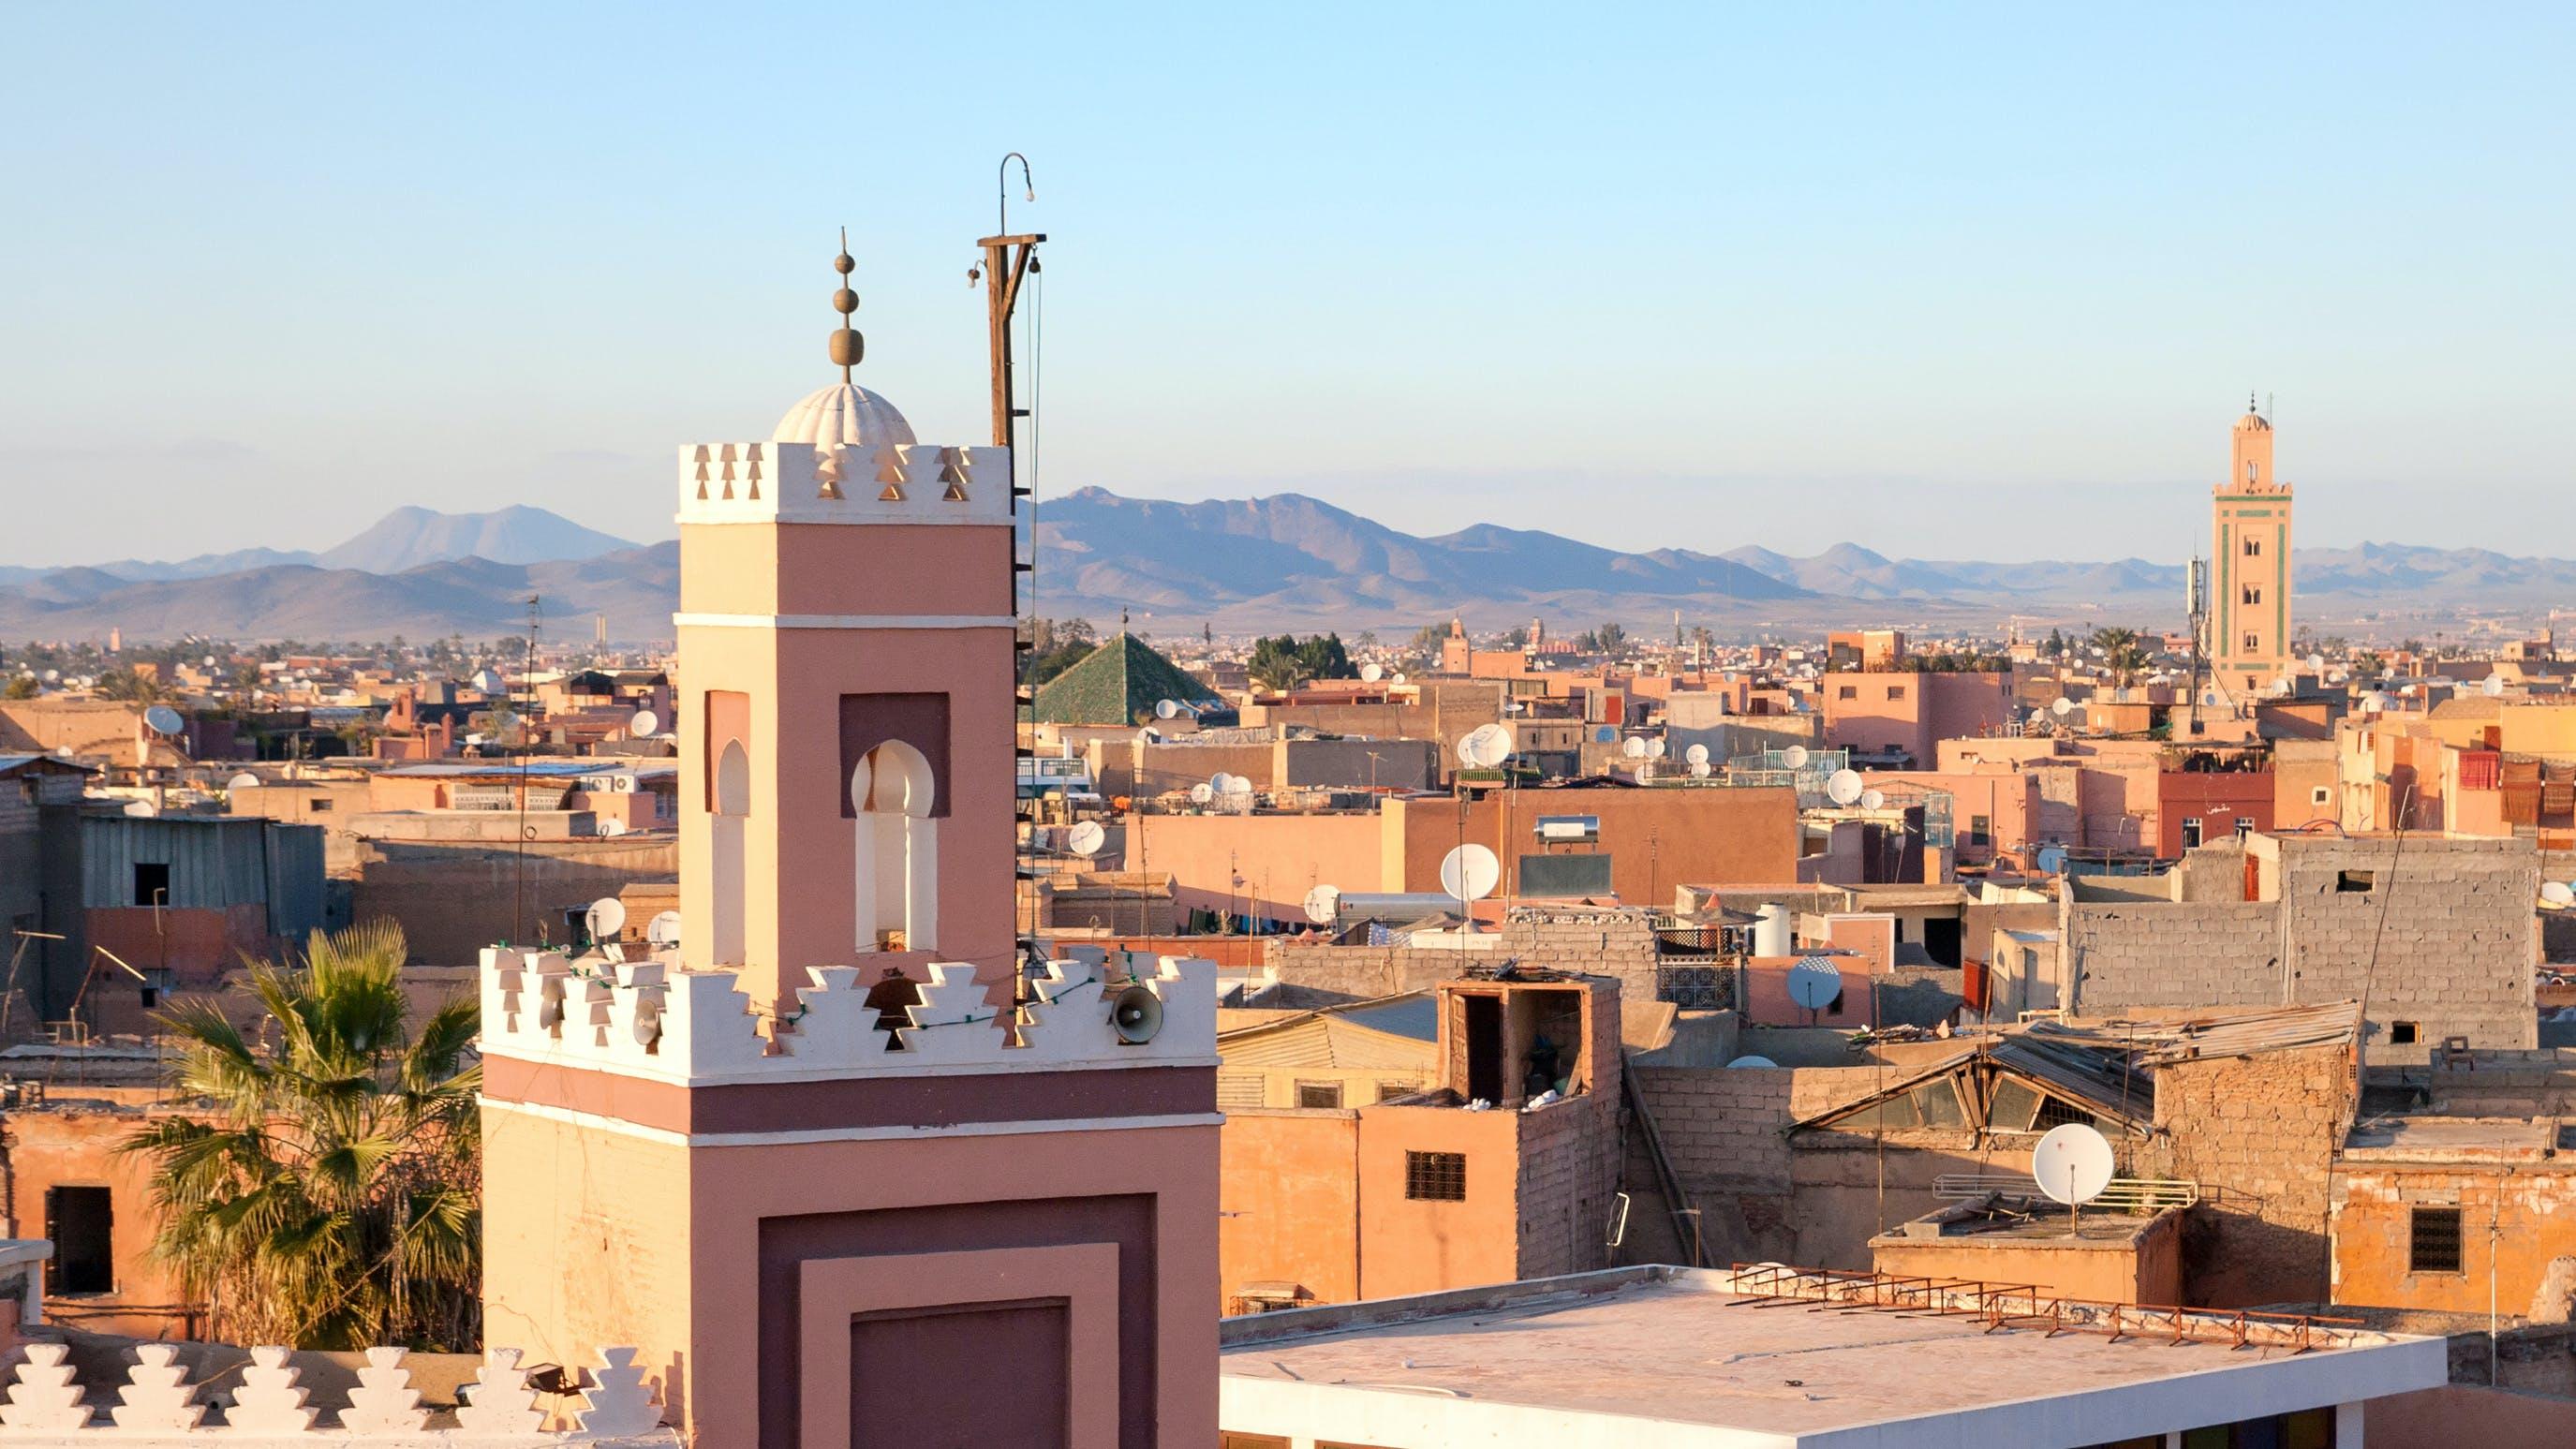 marrakech square hi res jpg header 151875